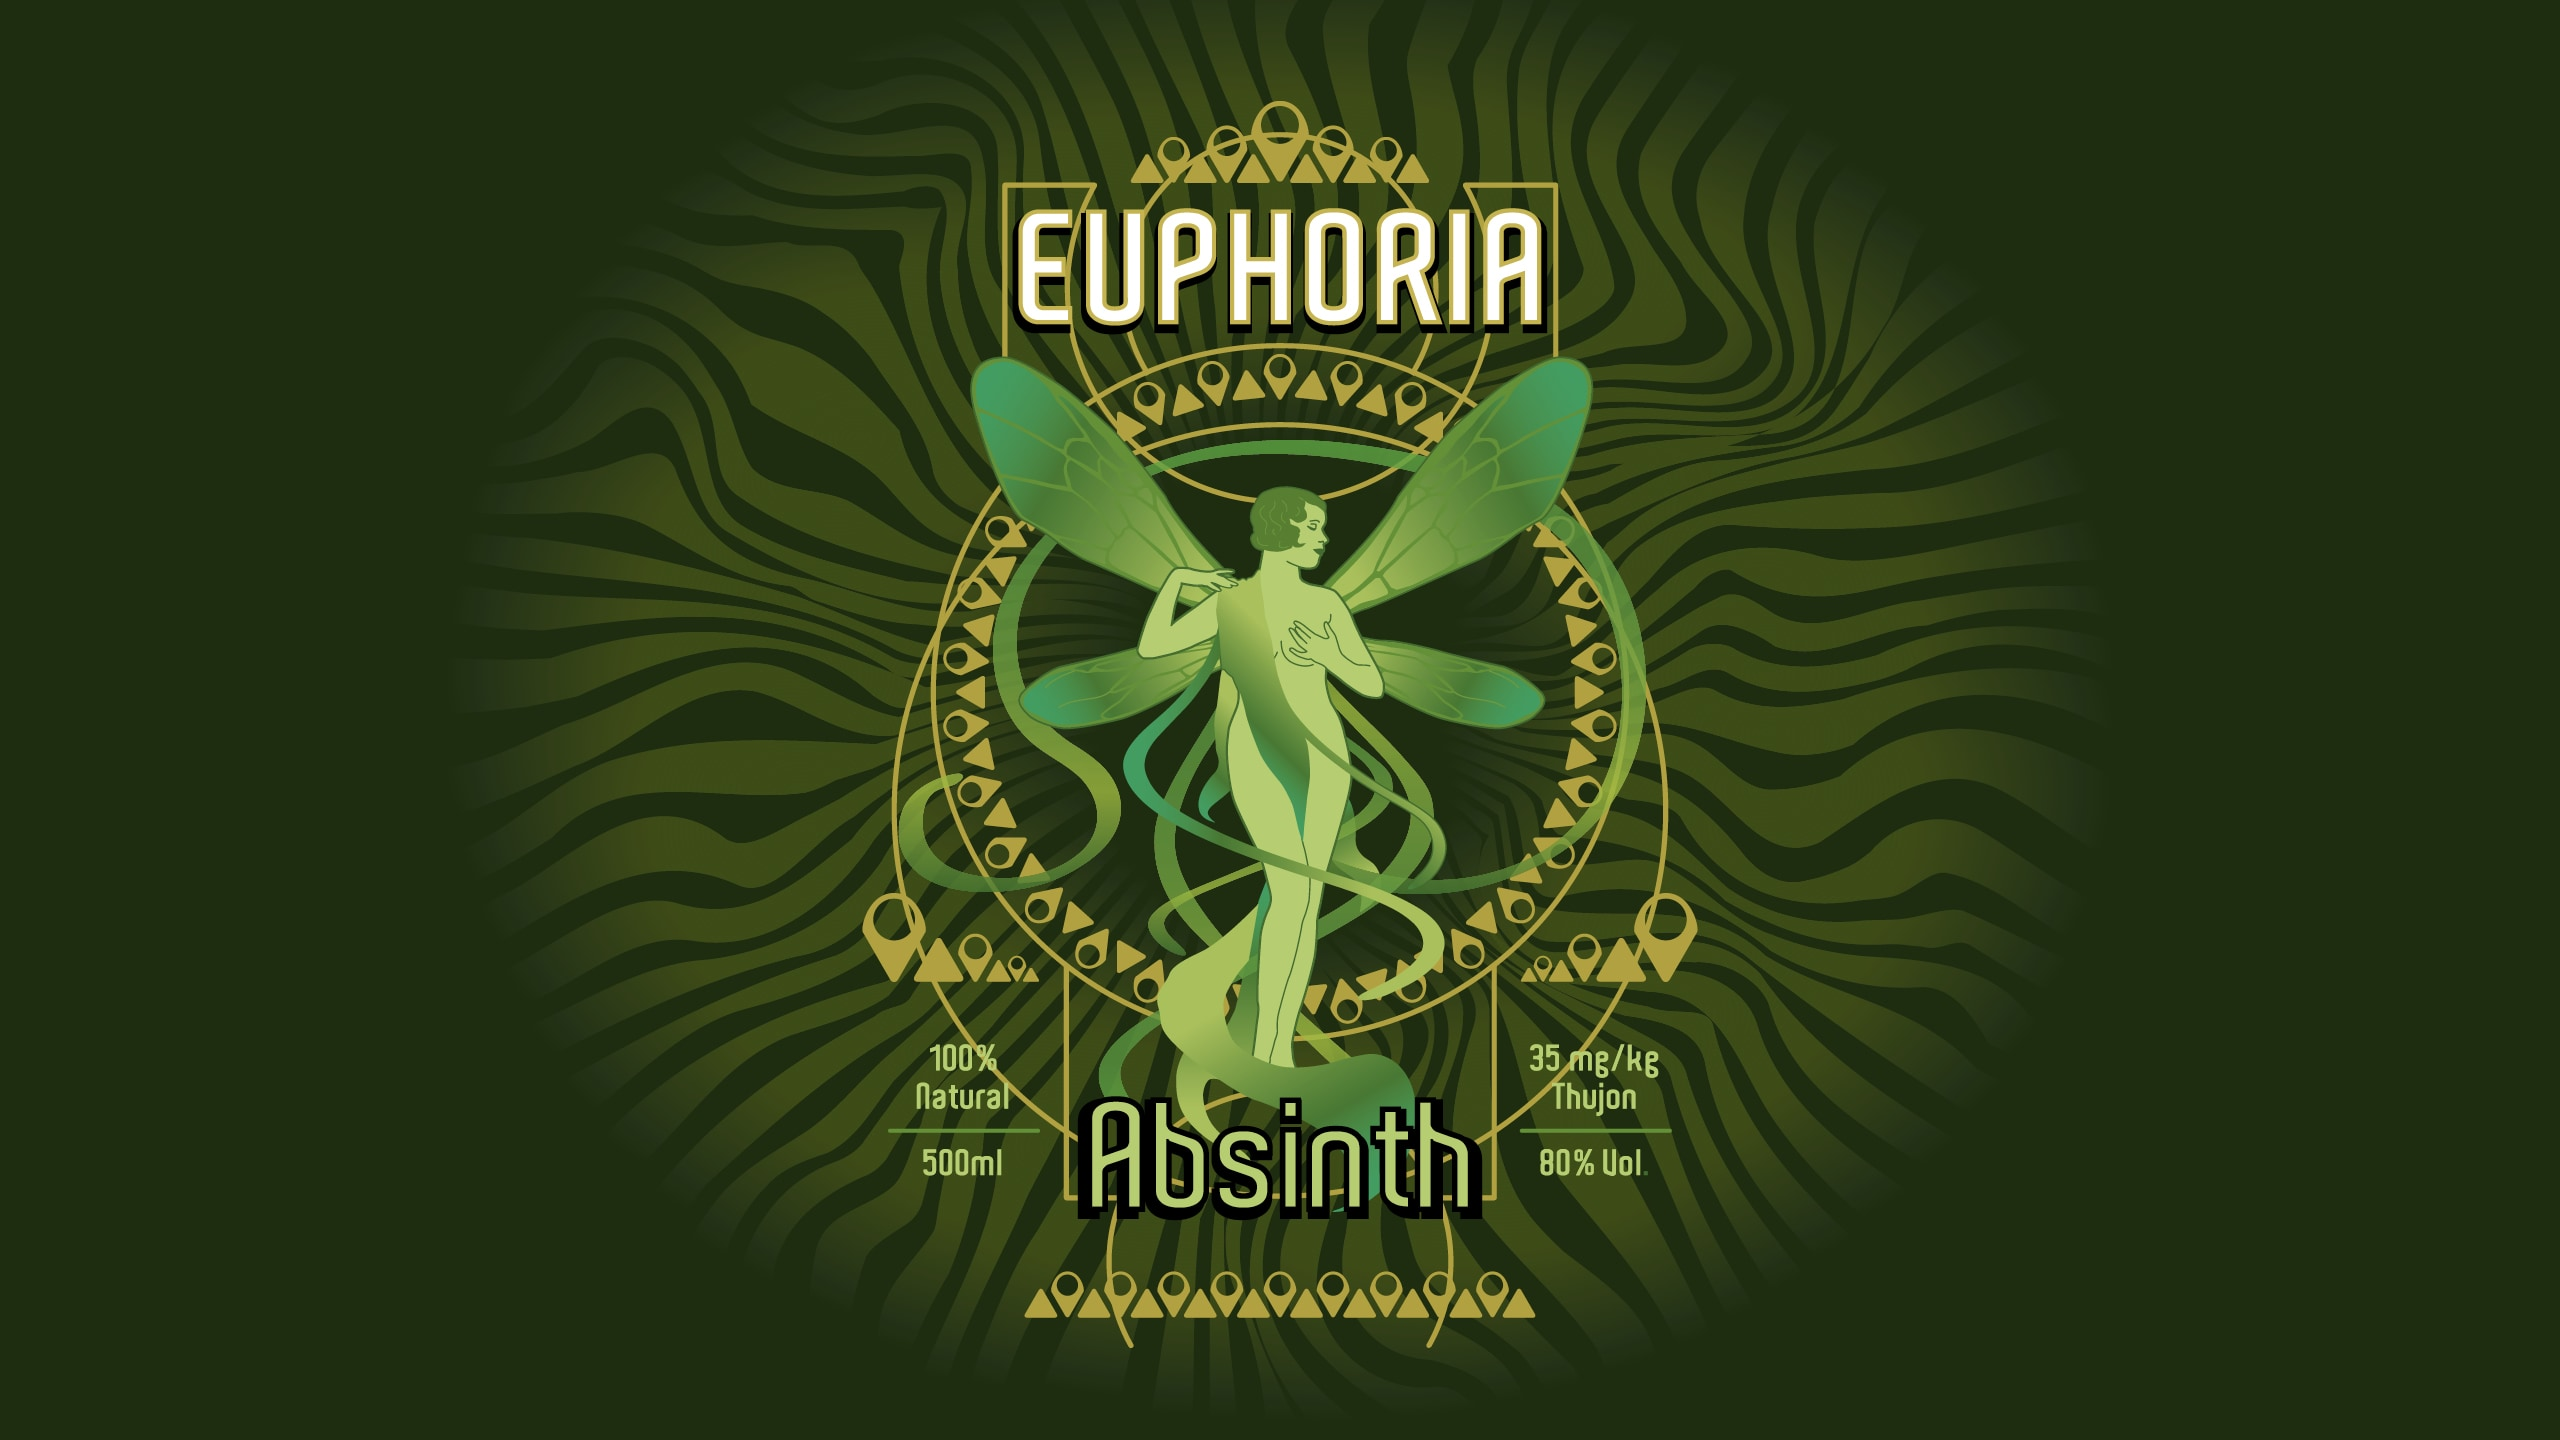 Euphoria_Absinth_3_m2